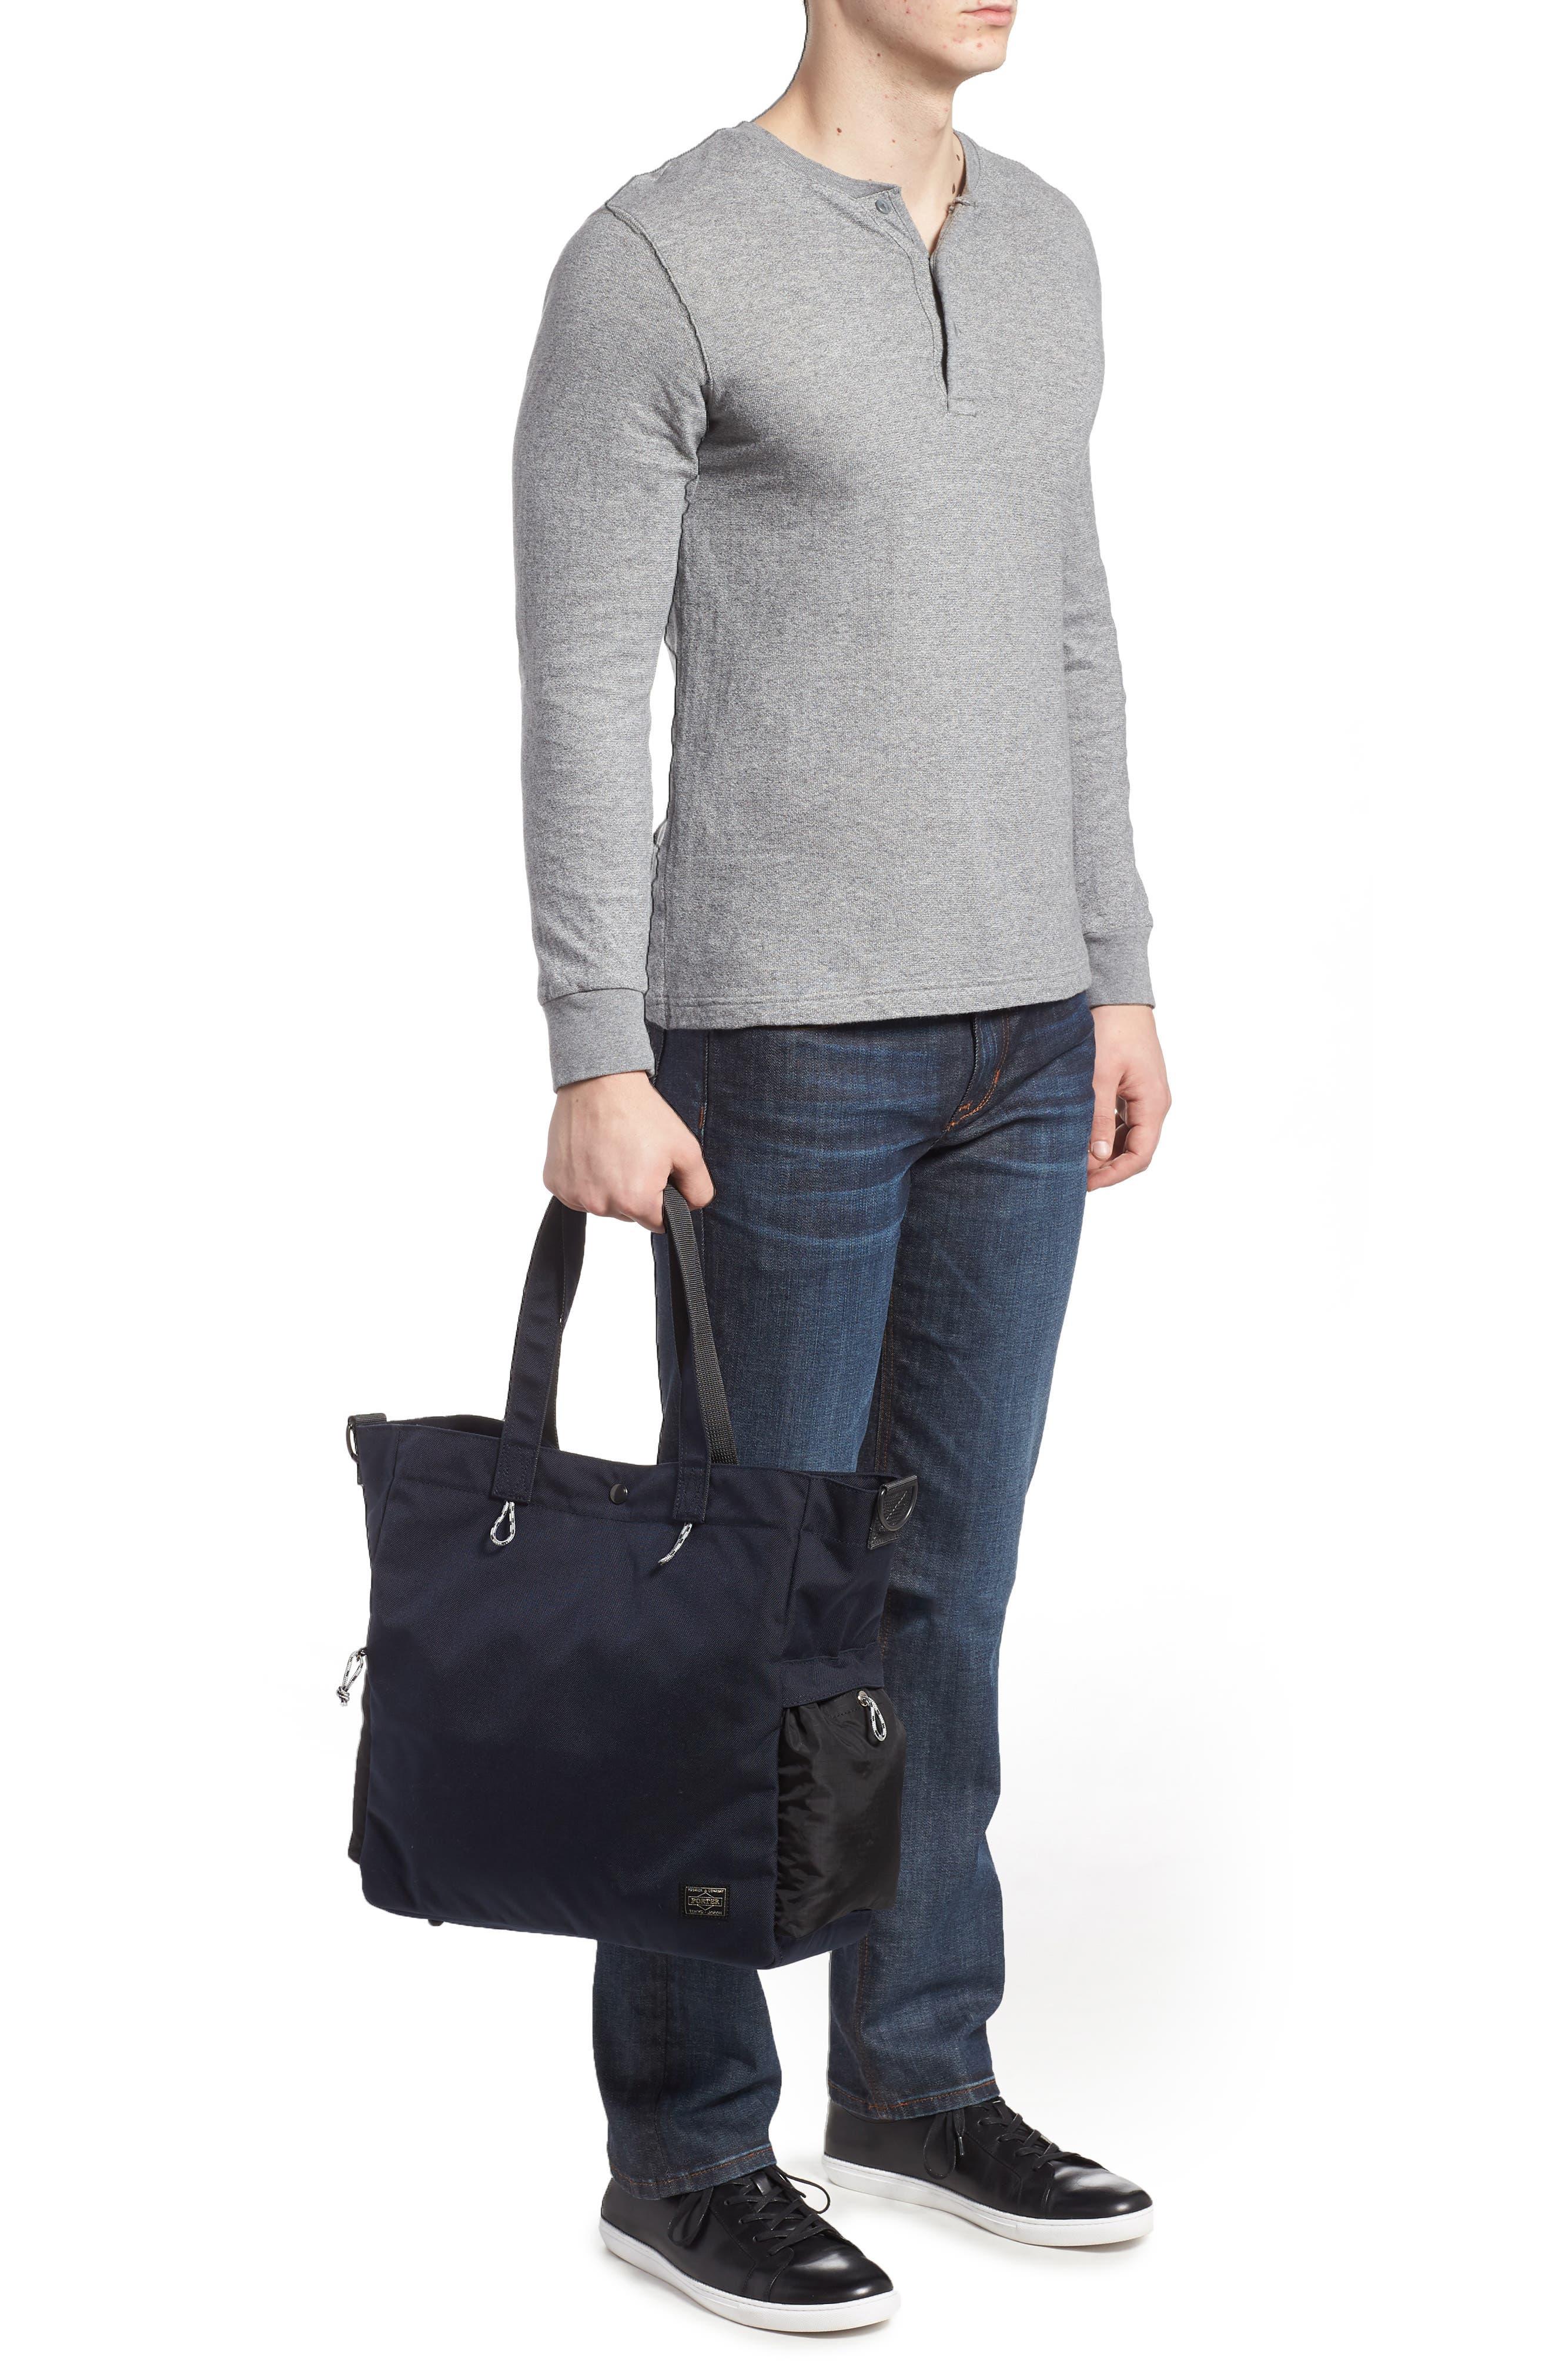 Porter-Yoshida & Co. Hype Tote Bag,                             Alternate thumbnail 2, color,                             400